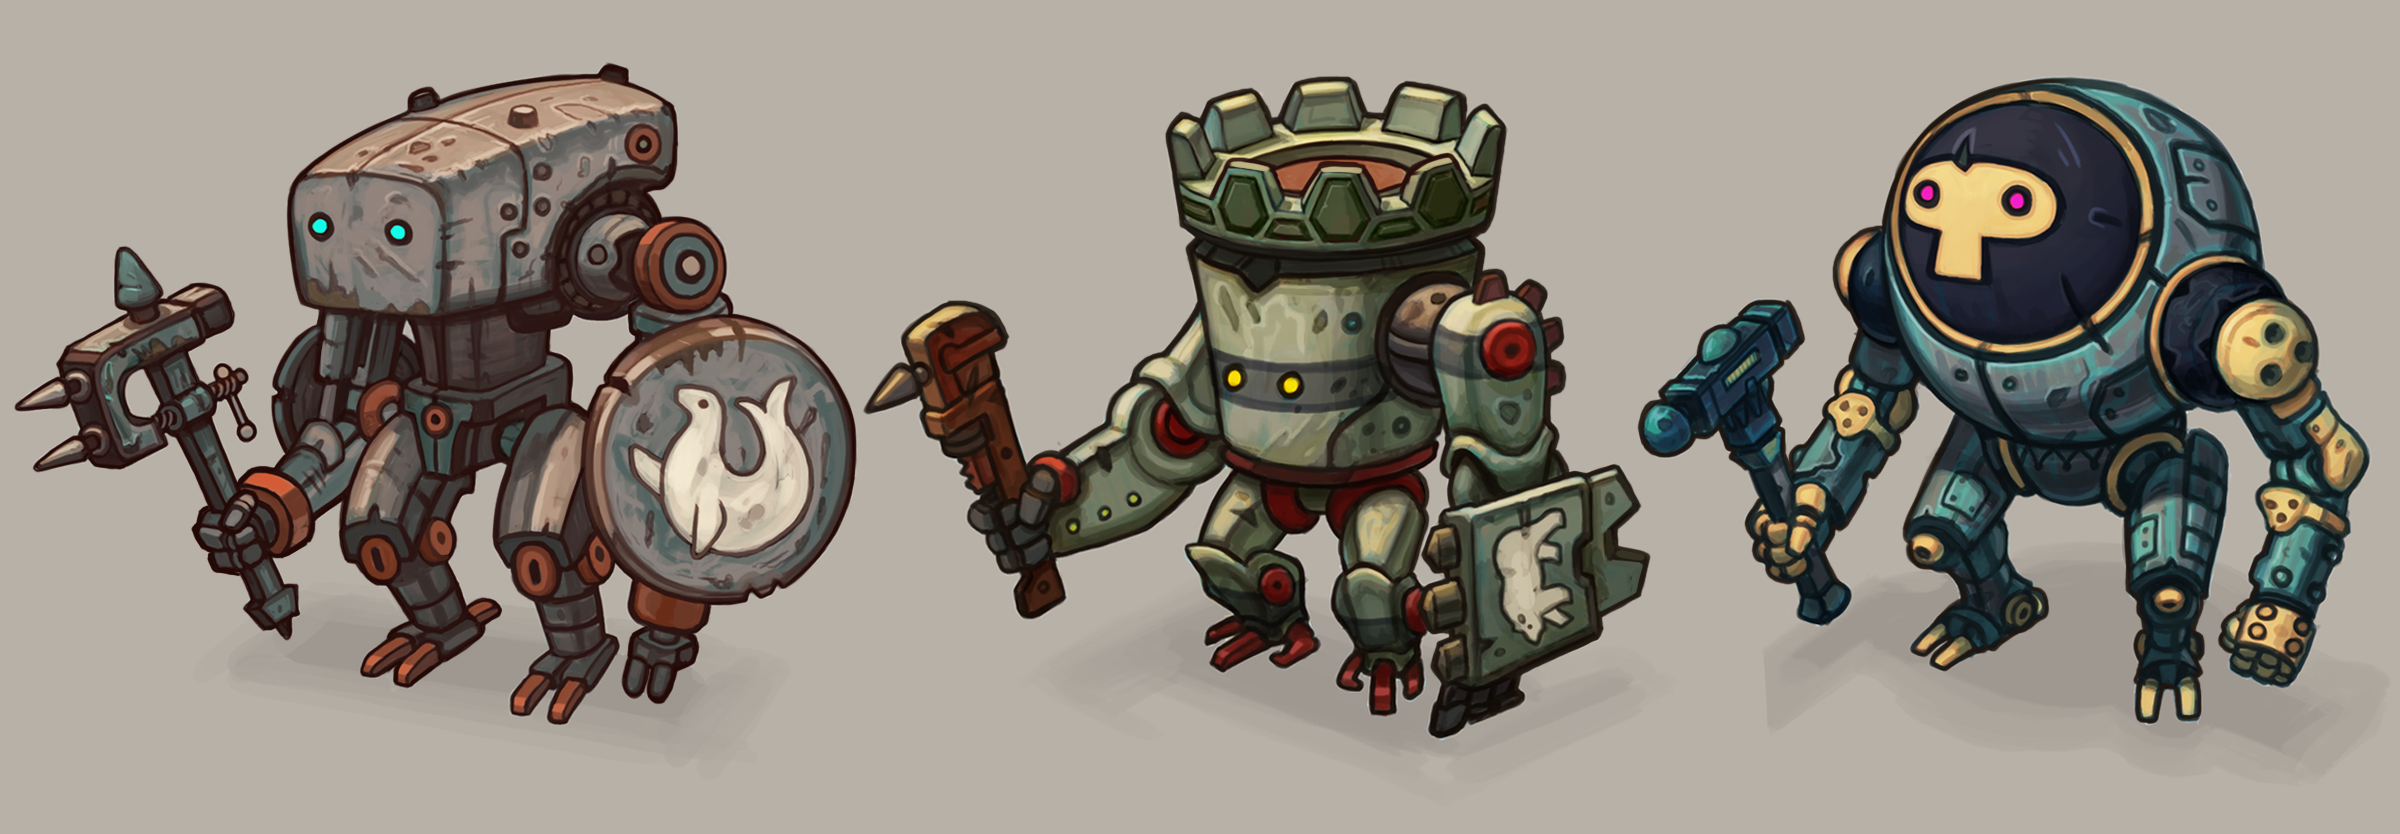 robo_knight_lineup.jpg